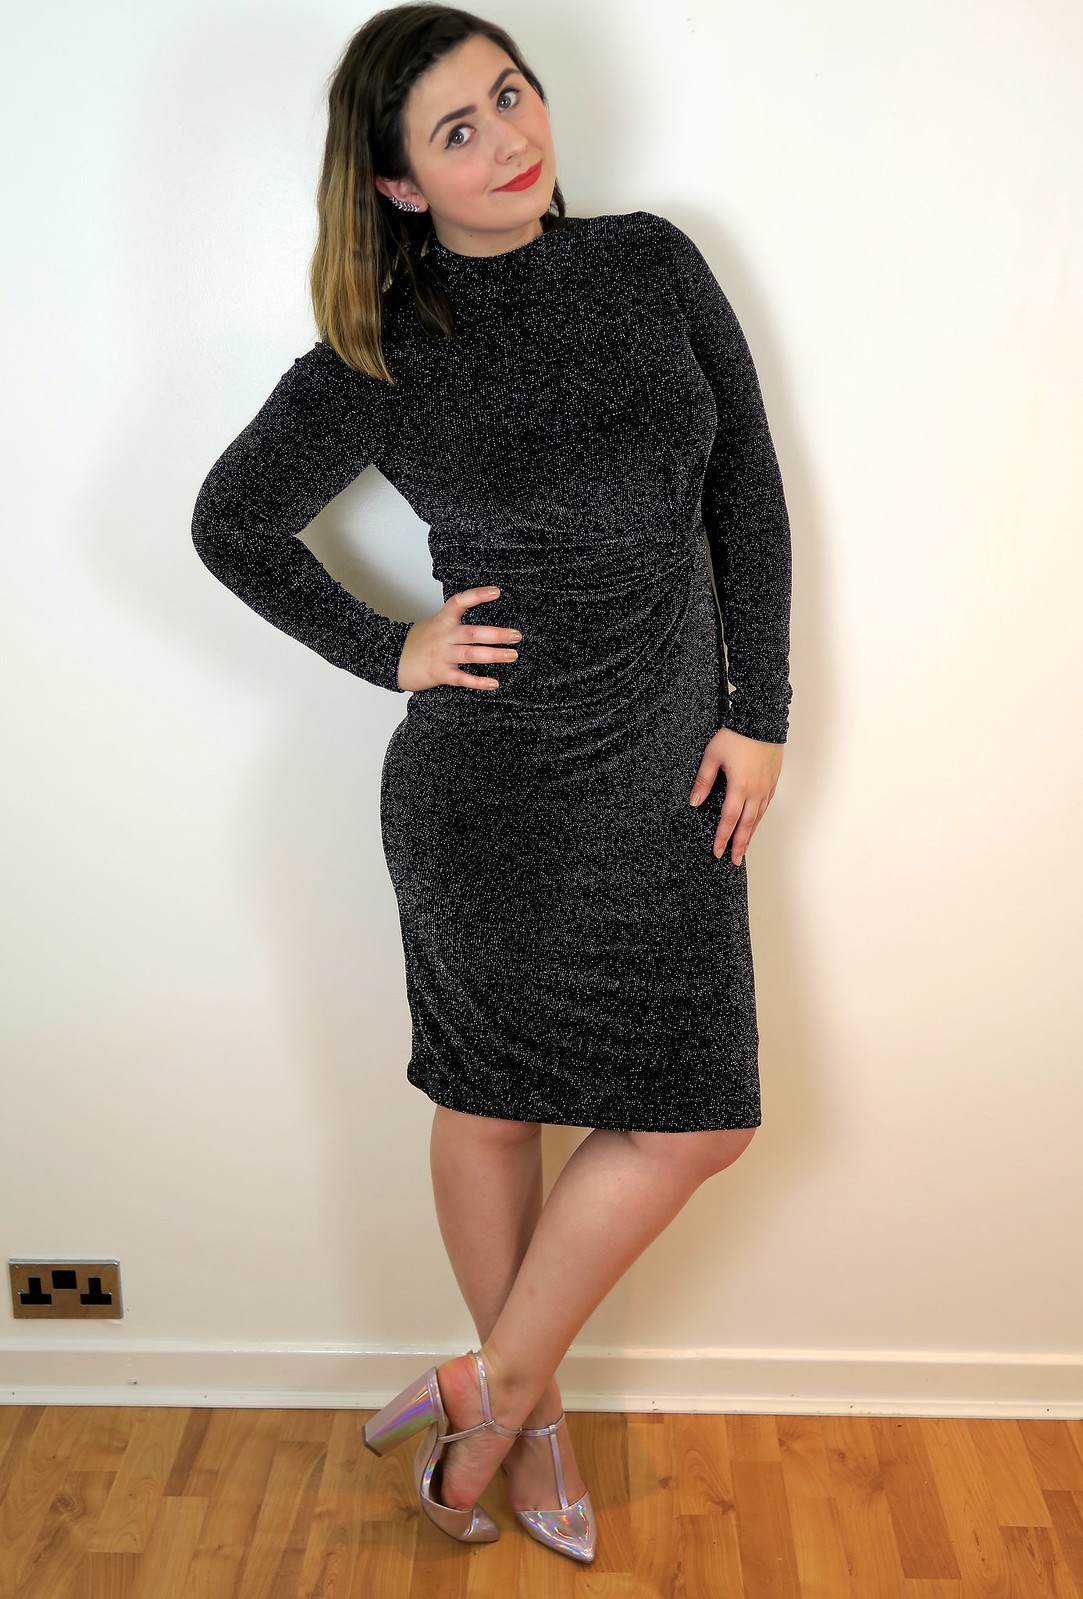 Wallis Party Persona Evening Starlet UK Fashion Lifestyle blogger